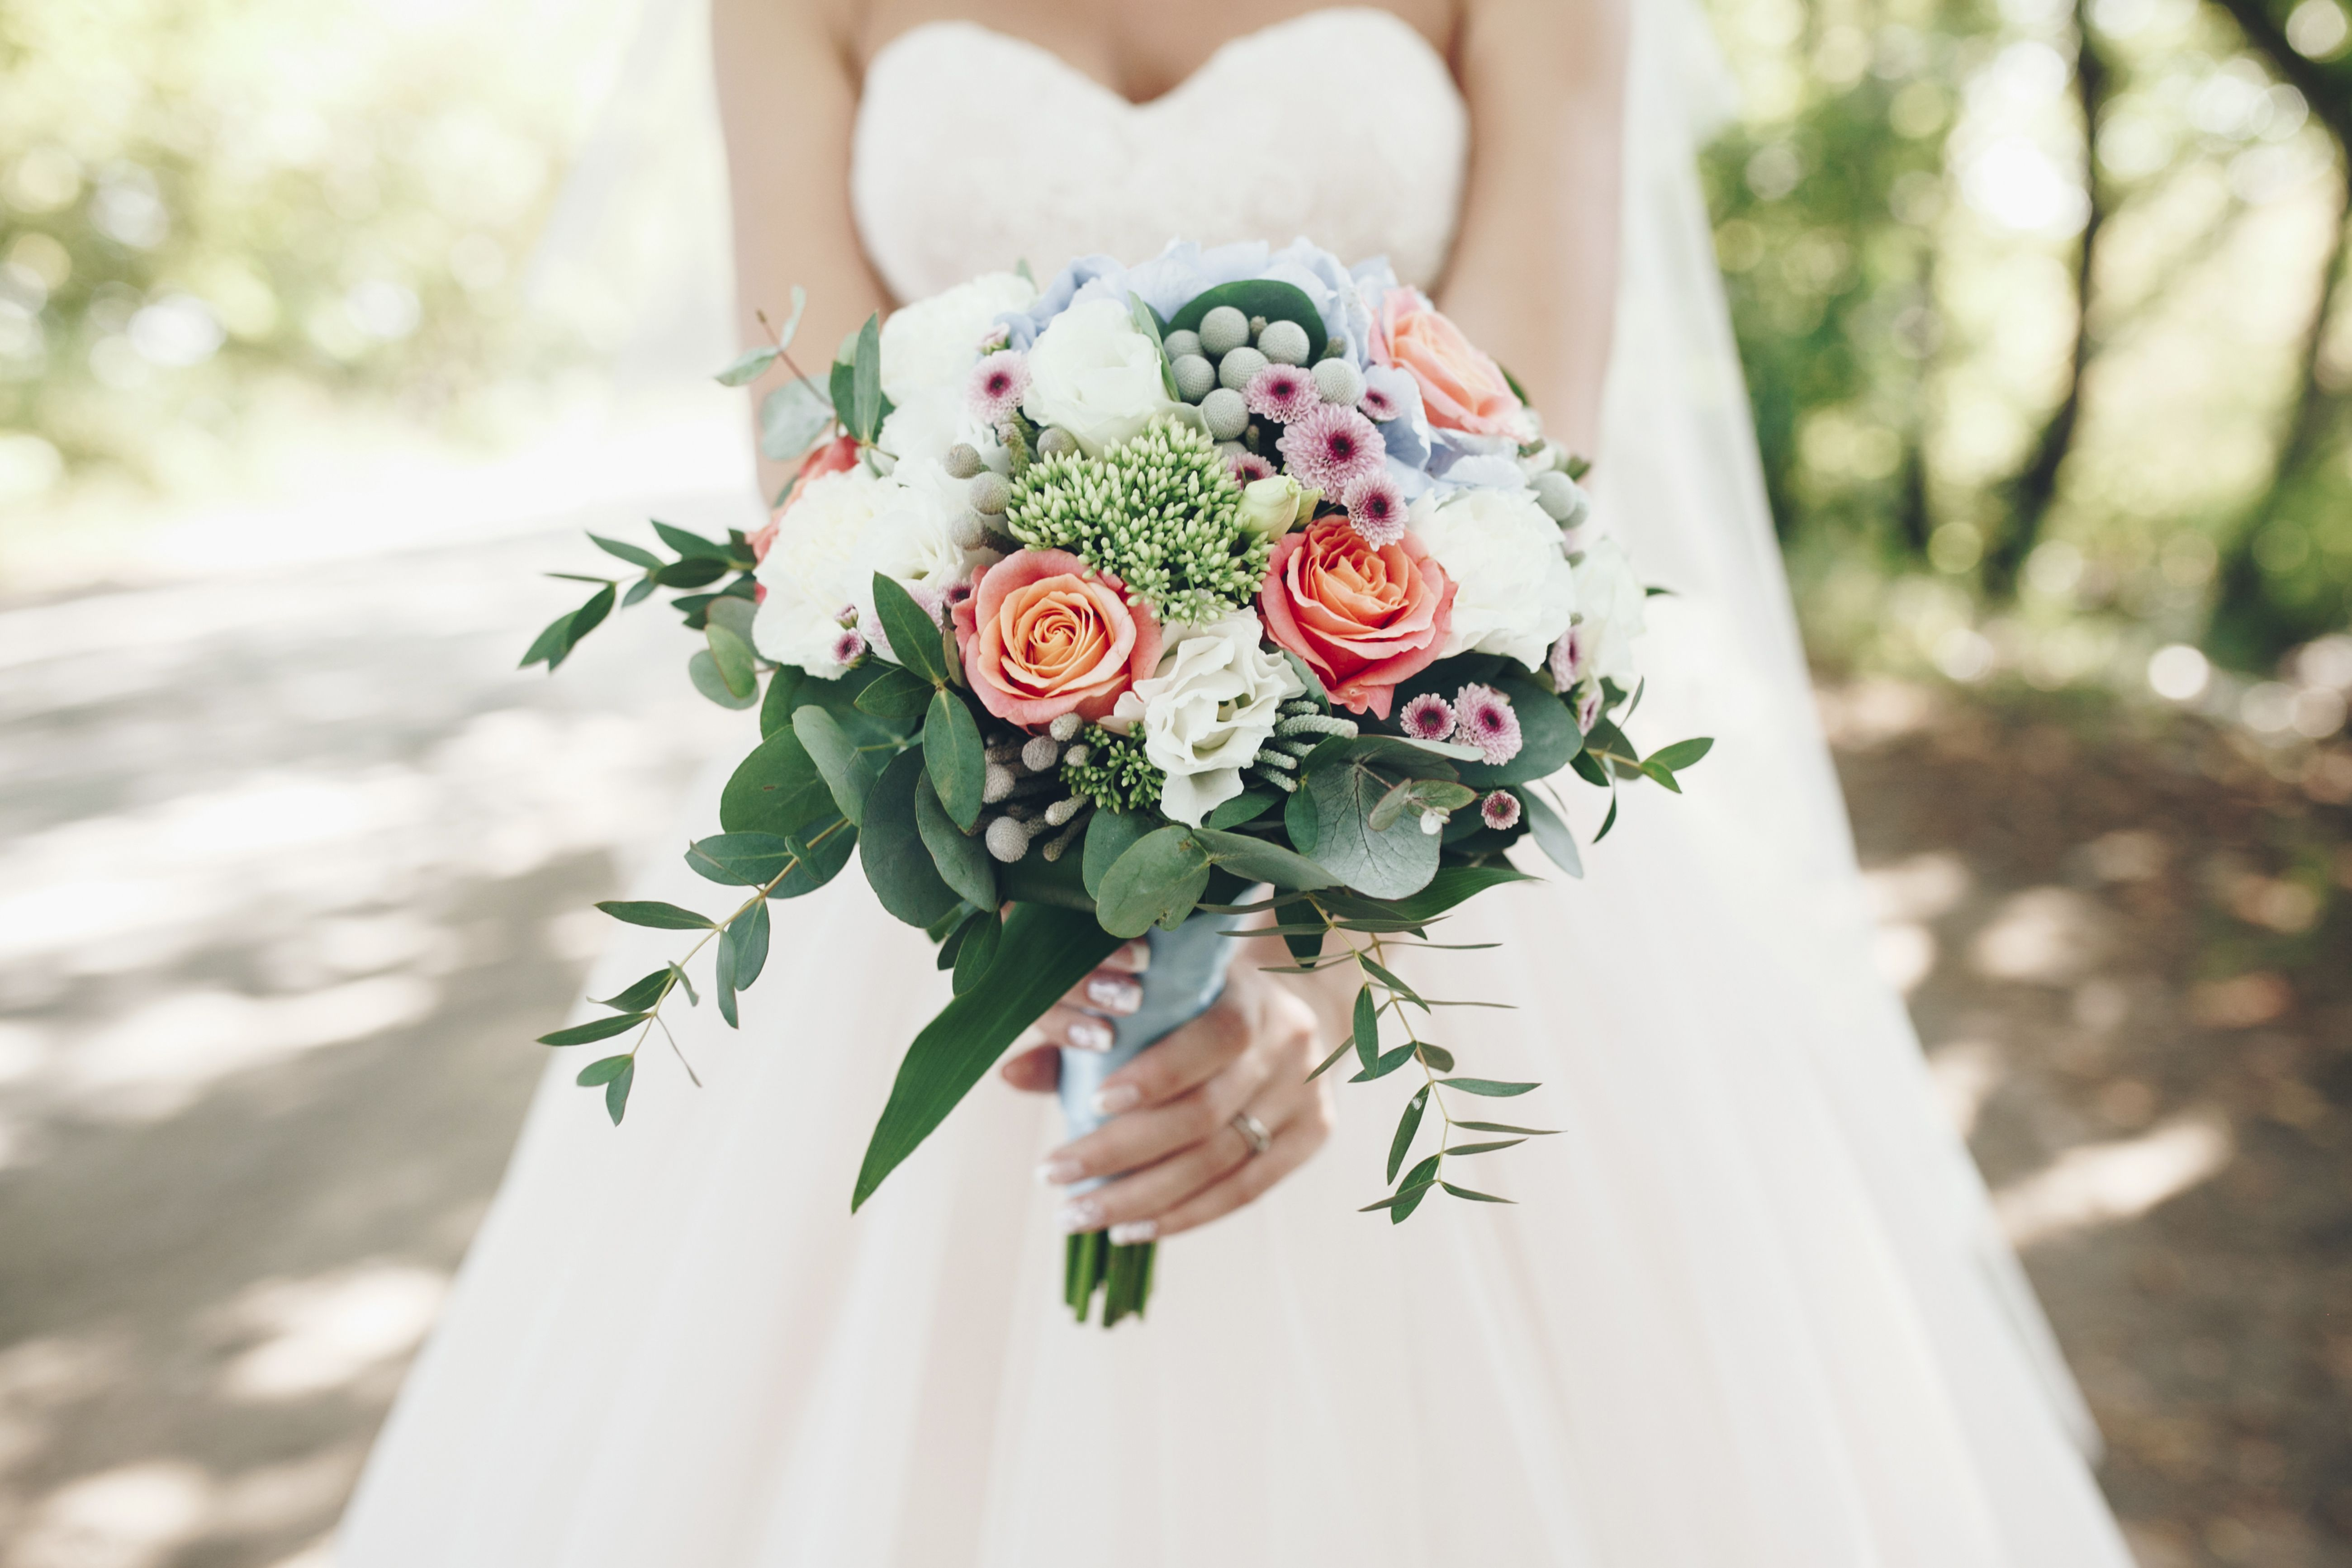 Cheap Wedding Flower Stores - BJ\'S, Costco, Sam\'s Club Wedding